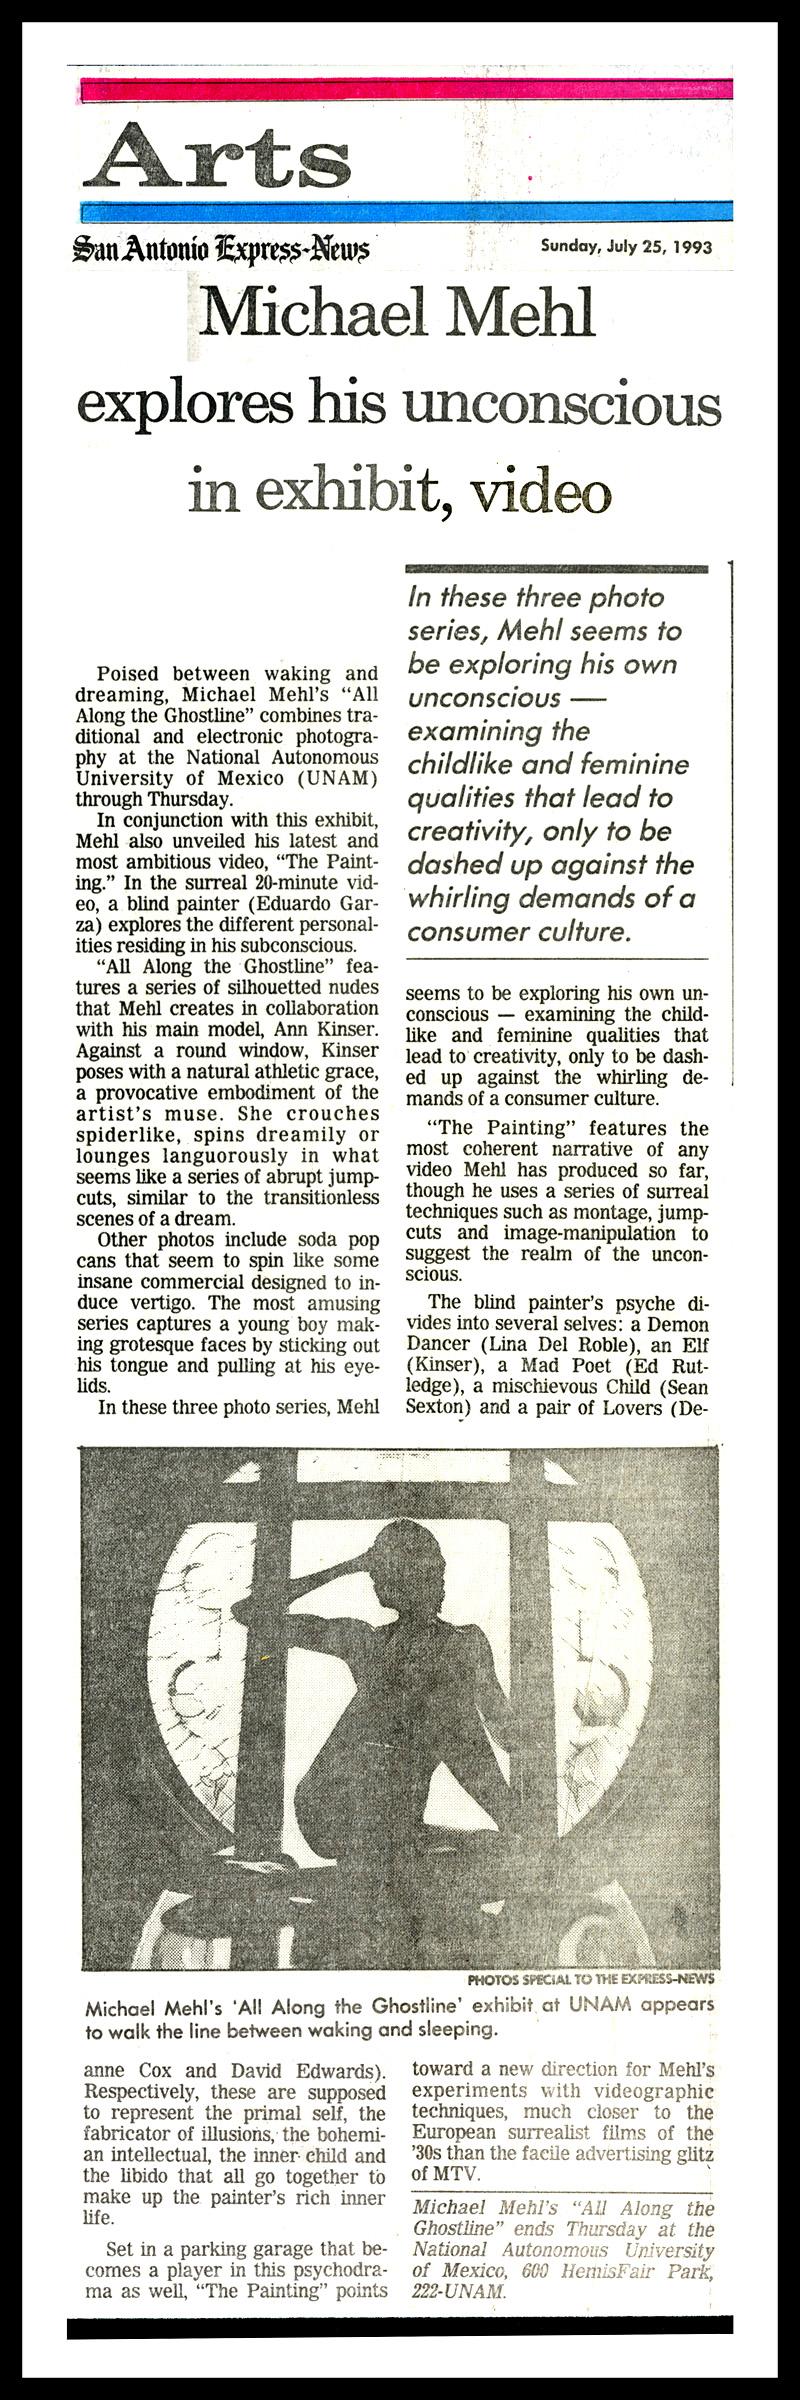 1993_Michael-Mehl_San-Antonio-Express-News_Ghostline-&-The-Painting_UNAM-San-Antonio